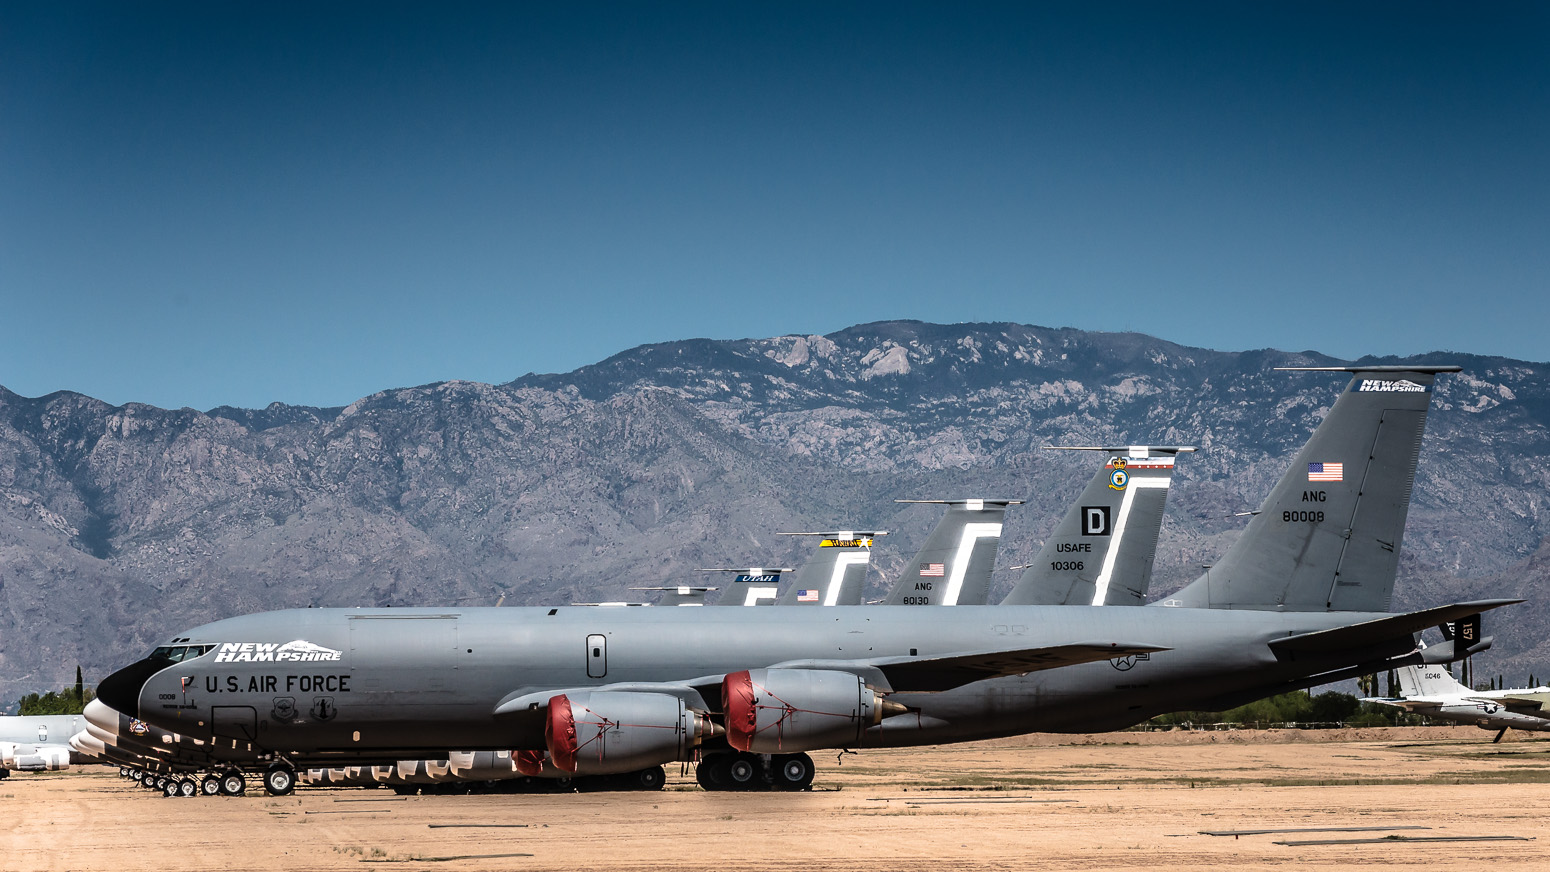 KC-135R, The Boneyard, Davis-Monthan Air Force Base, Tucson, USA